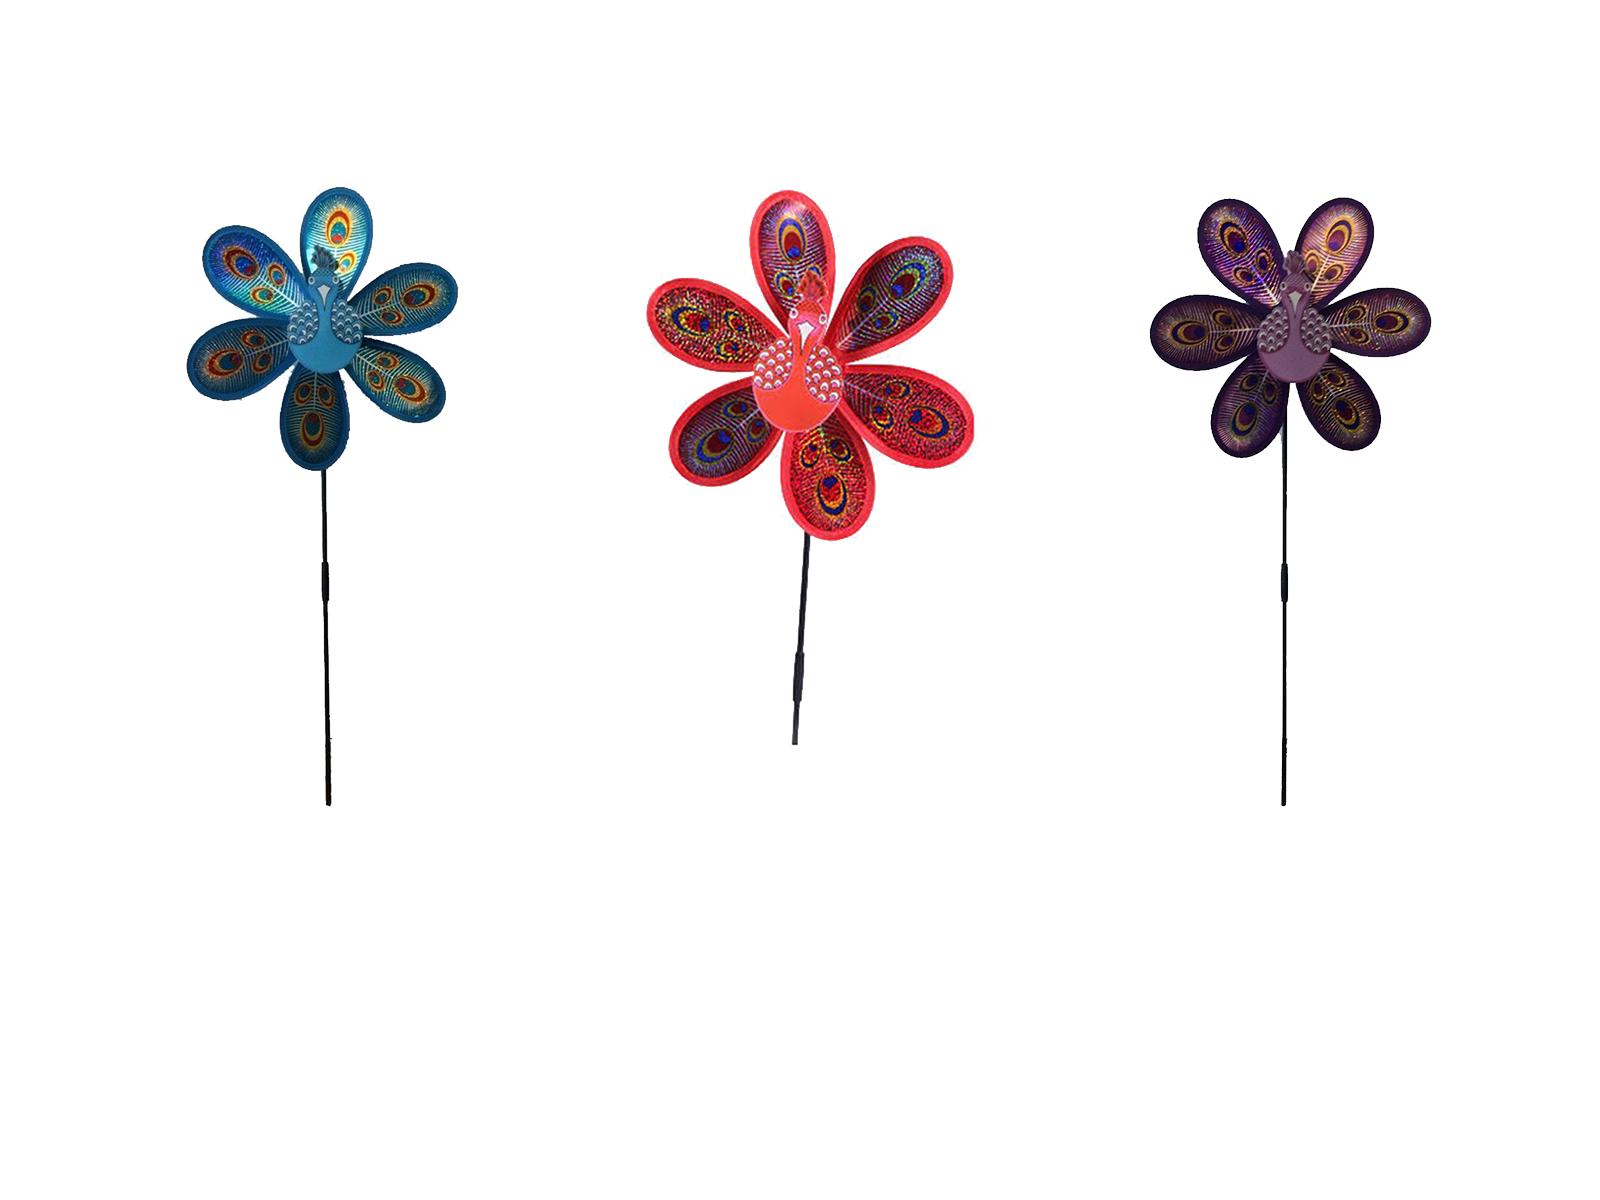 2 x Holographic Peacock Windmill Pinwheel Wind Spinner Lawn Garden Decor kids